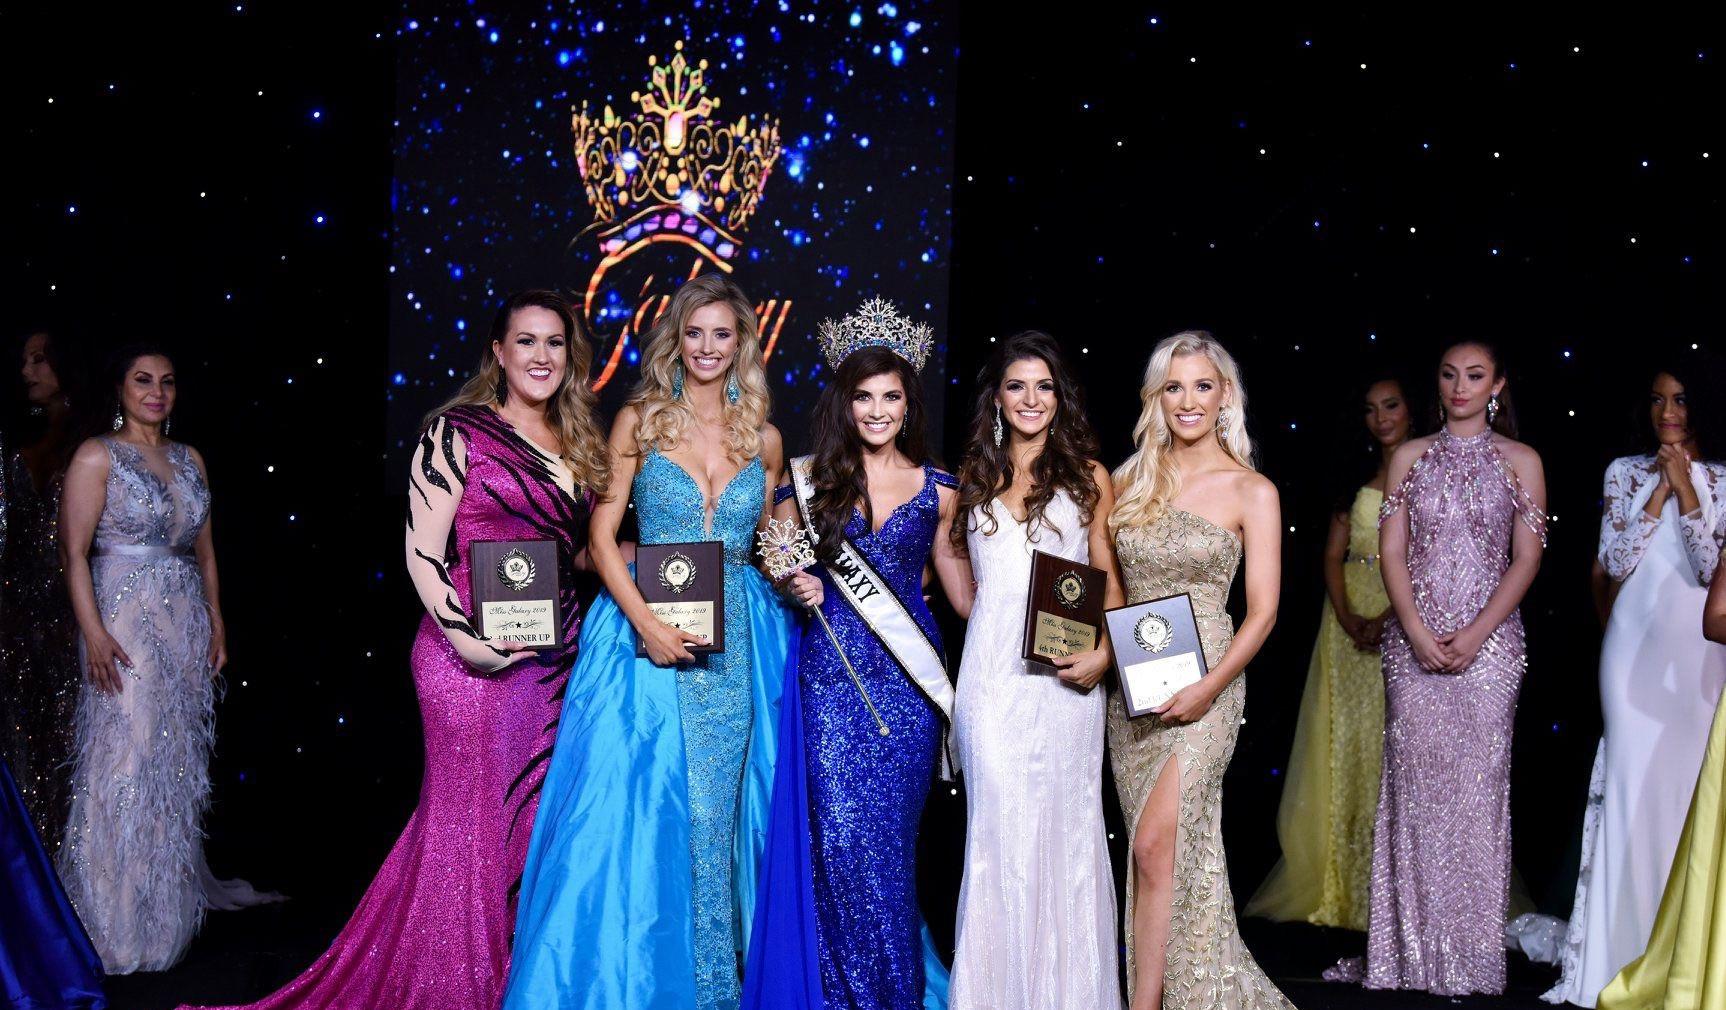 Congratulations Alicia, Miss Galaxy® 2020 1st Runner Up